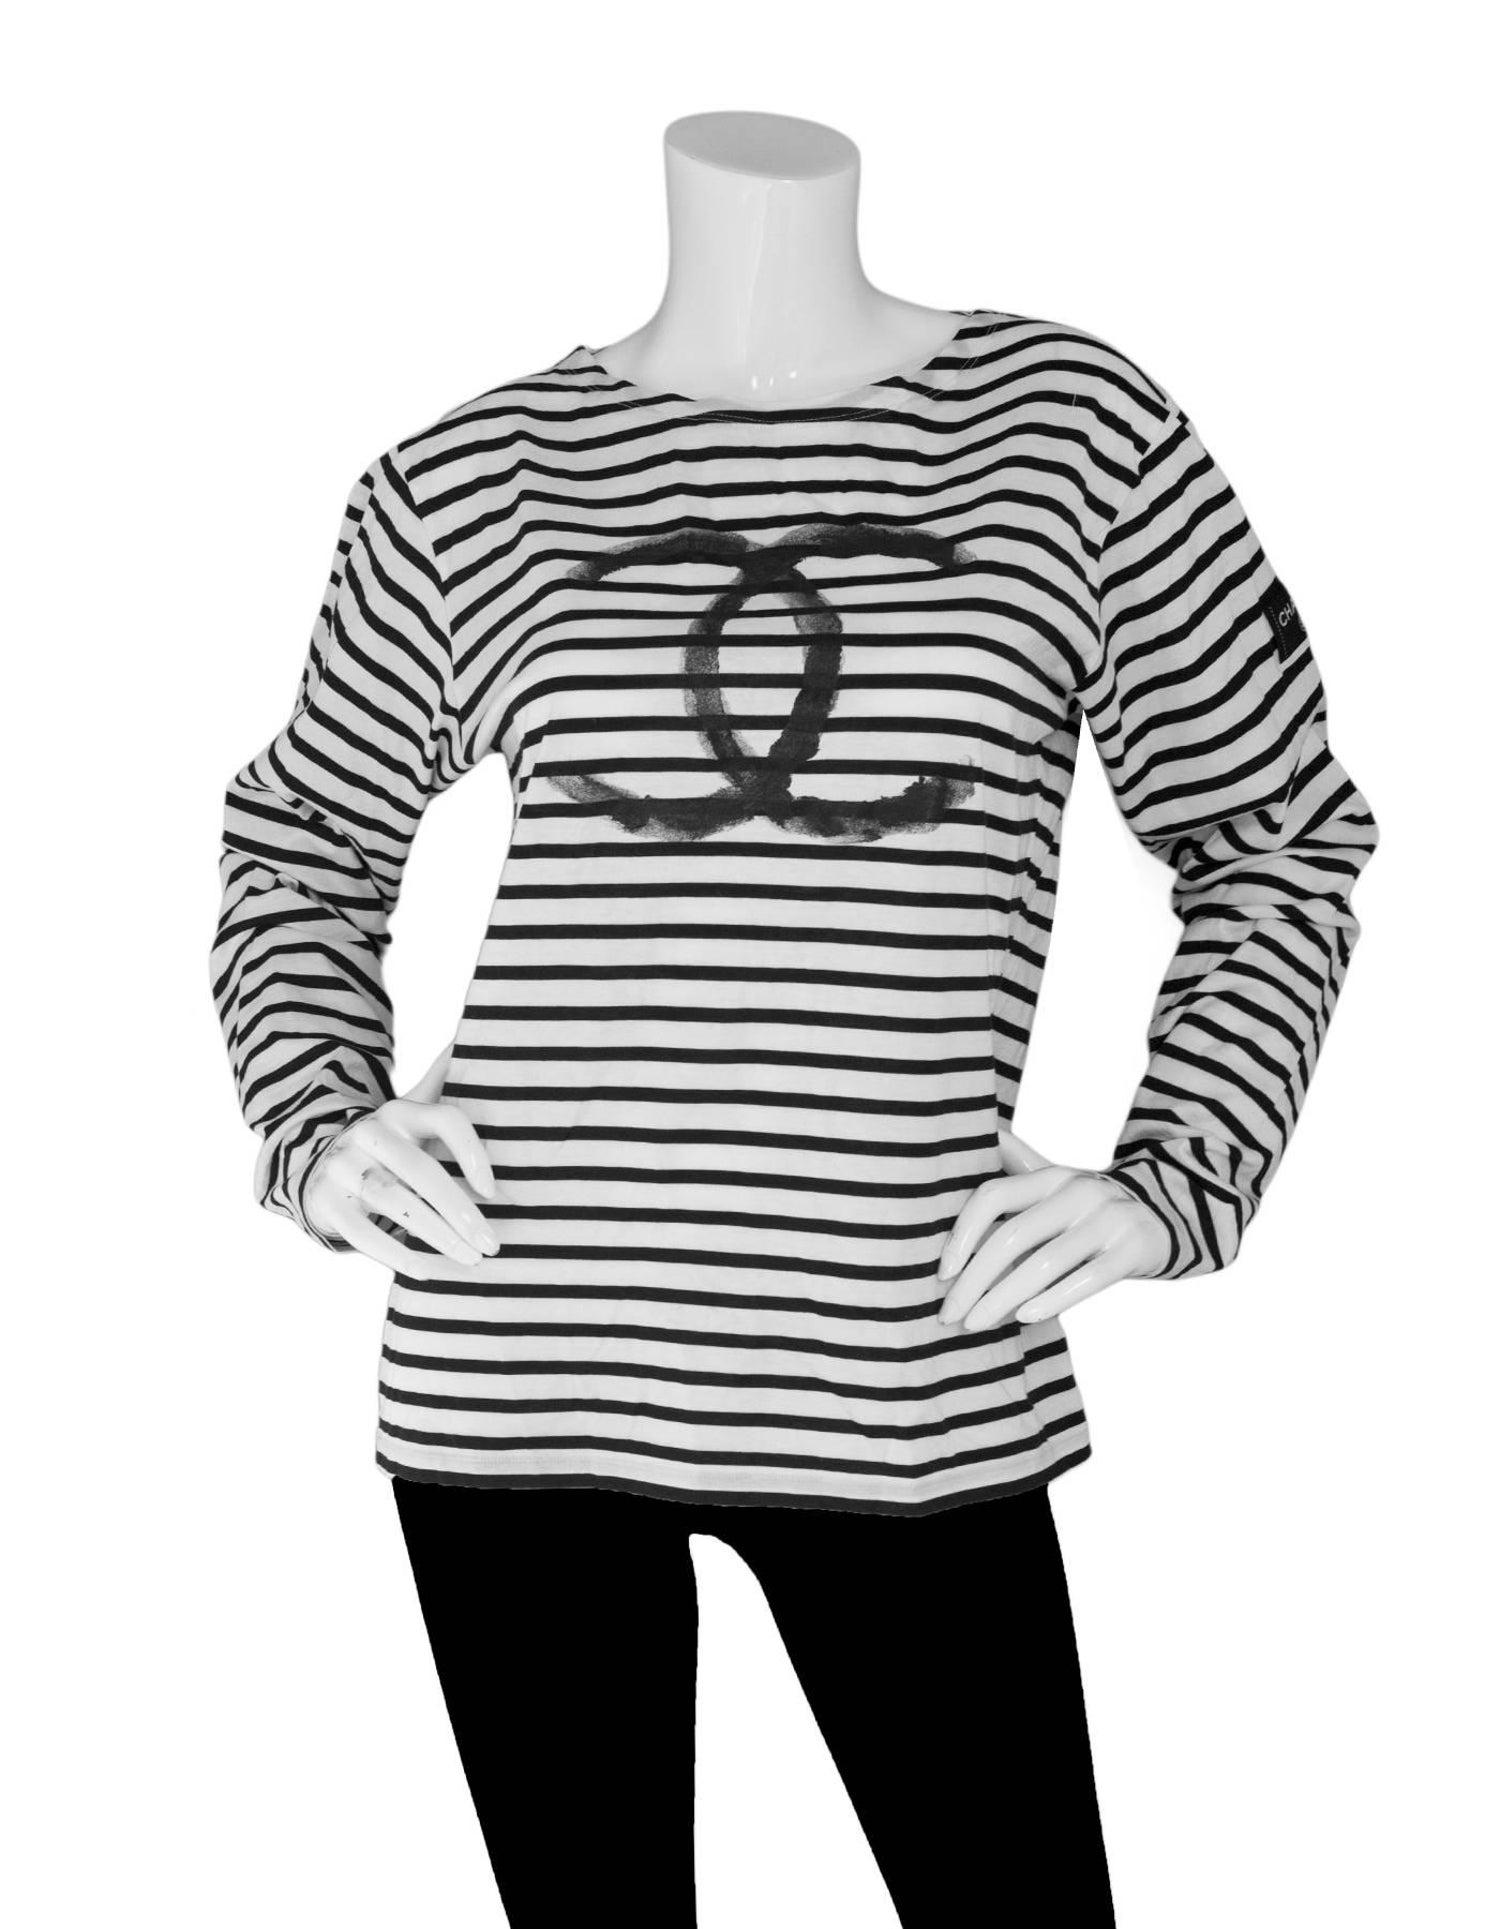 Chanel black and white stripe cc uniform top sz l at 1stdibs